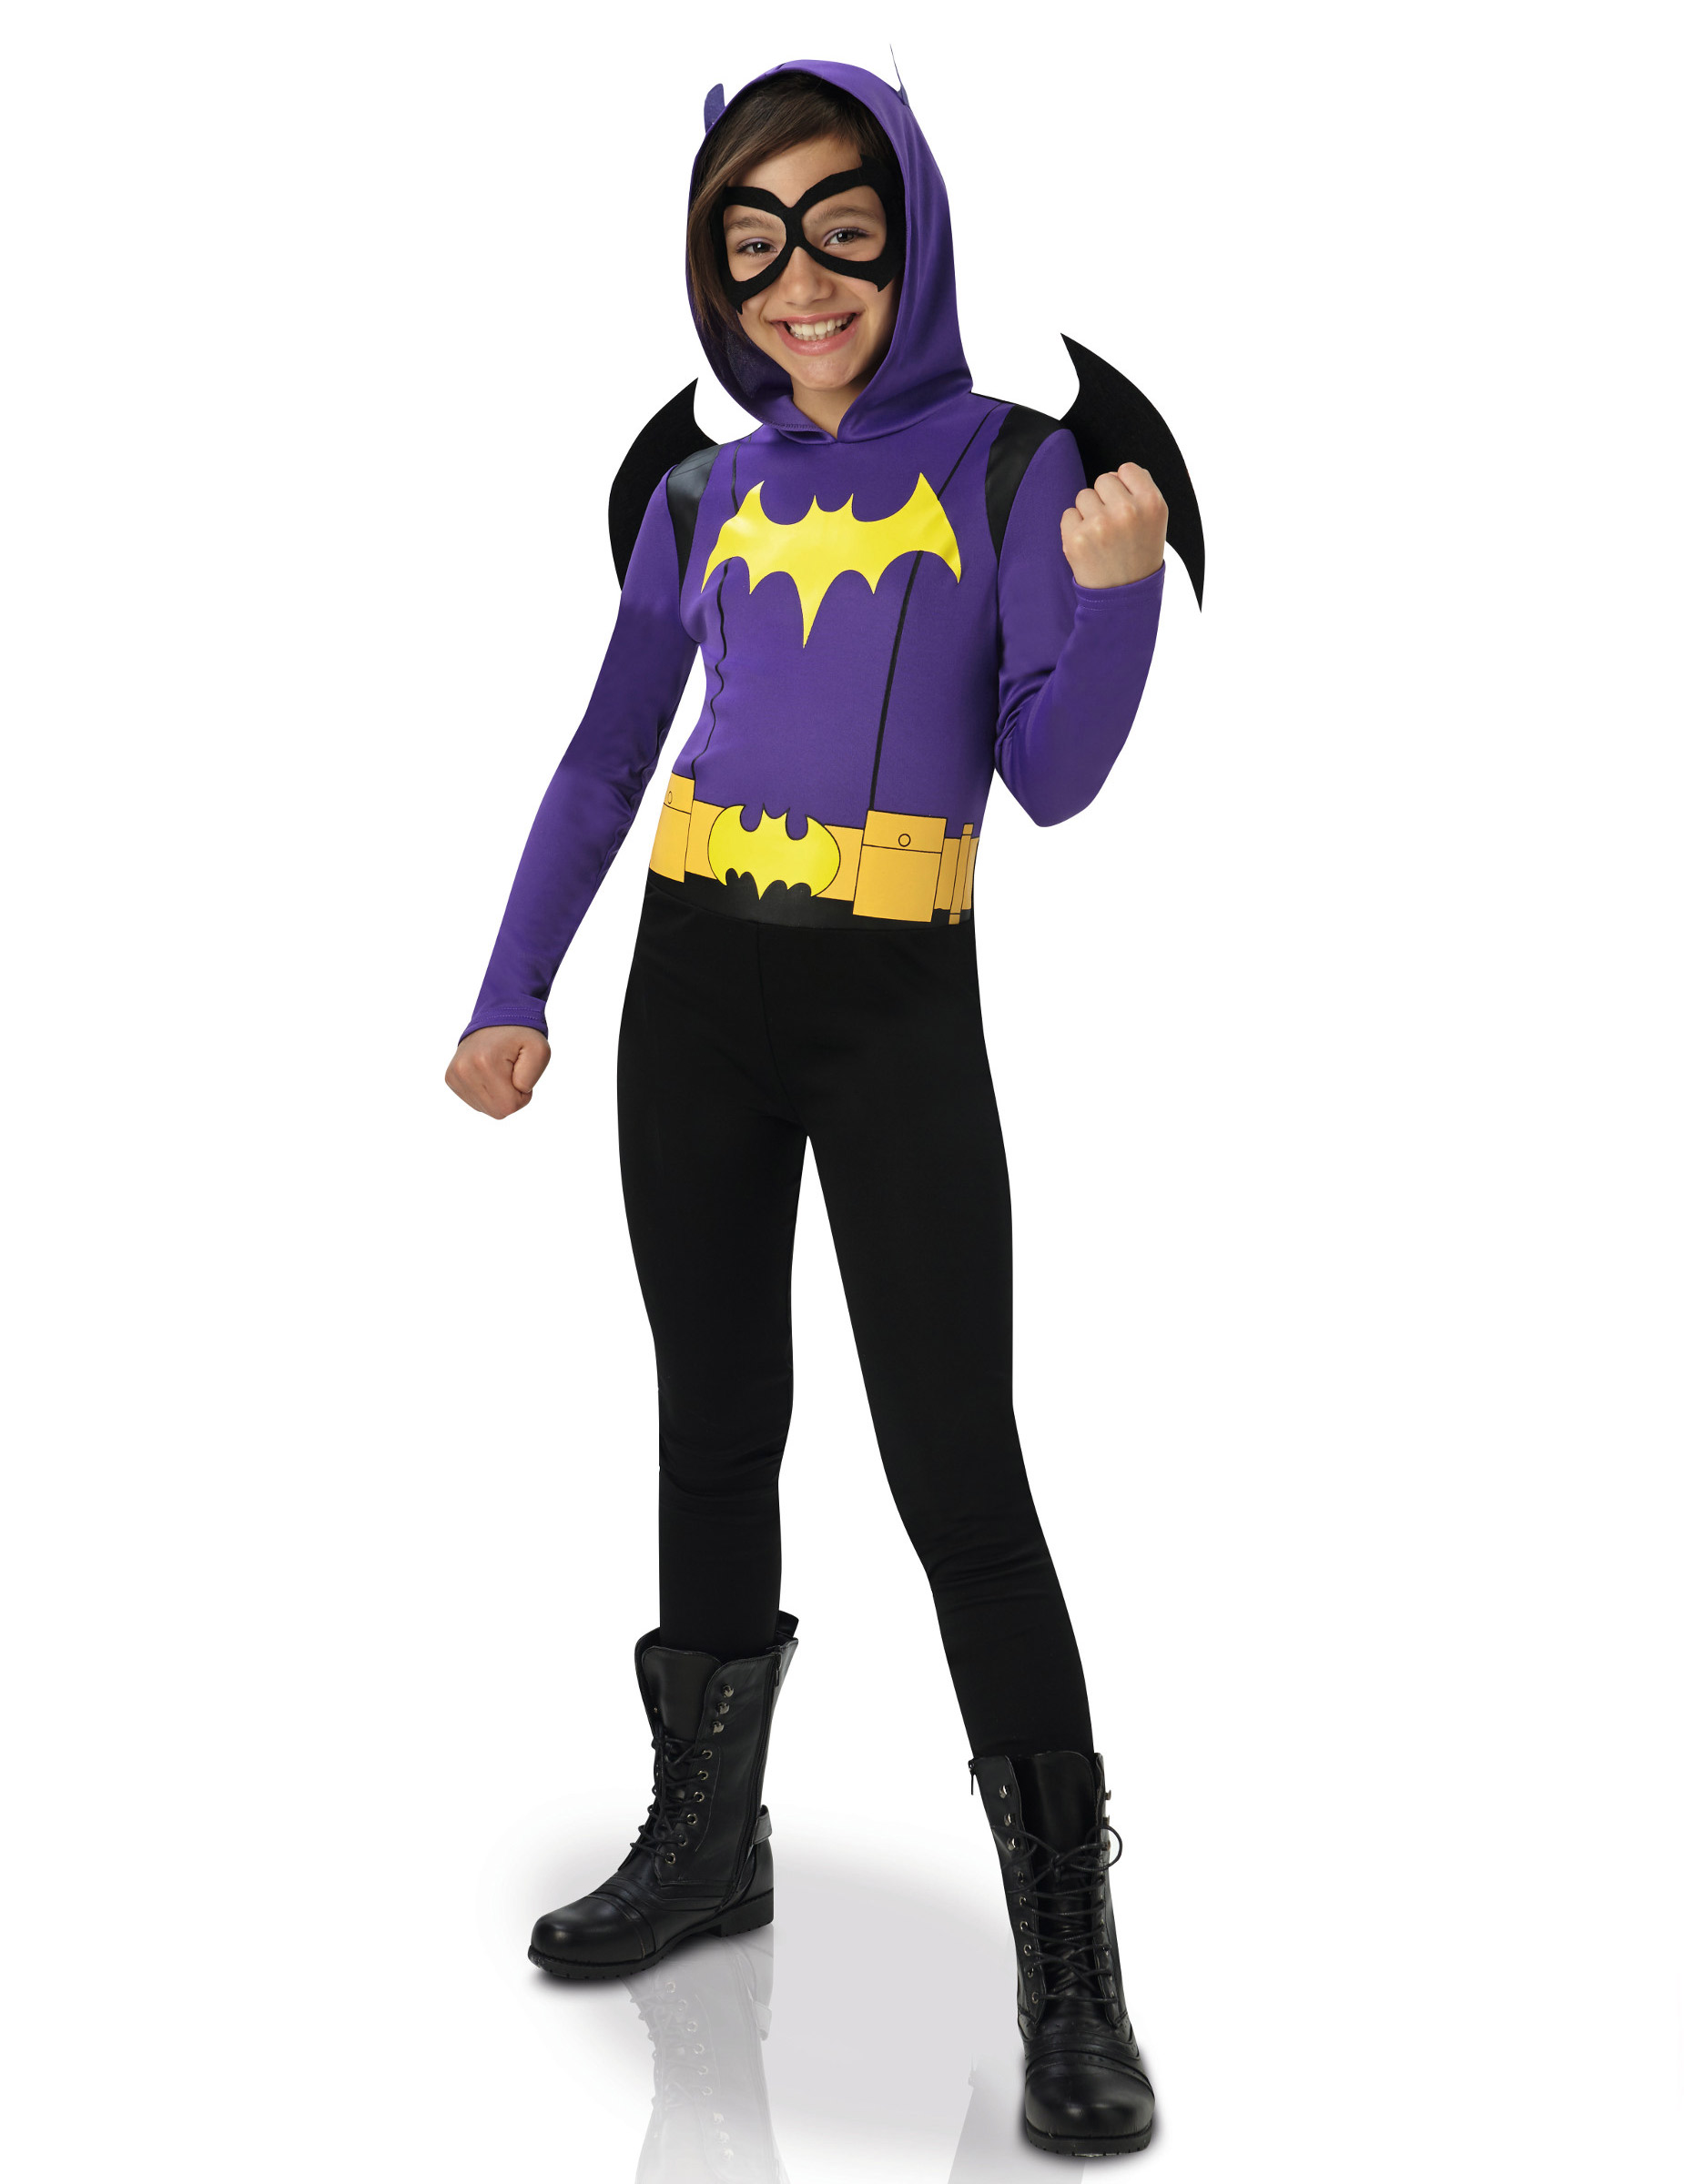 dguisement classique batgirl super hero girls fille - Super Heros Fille